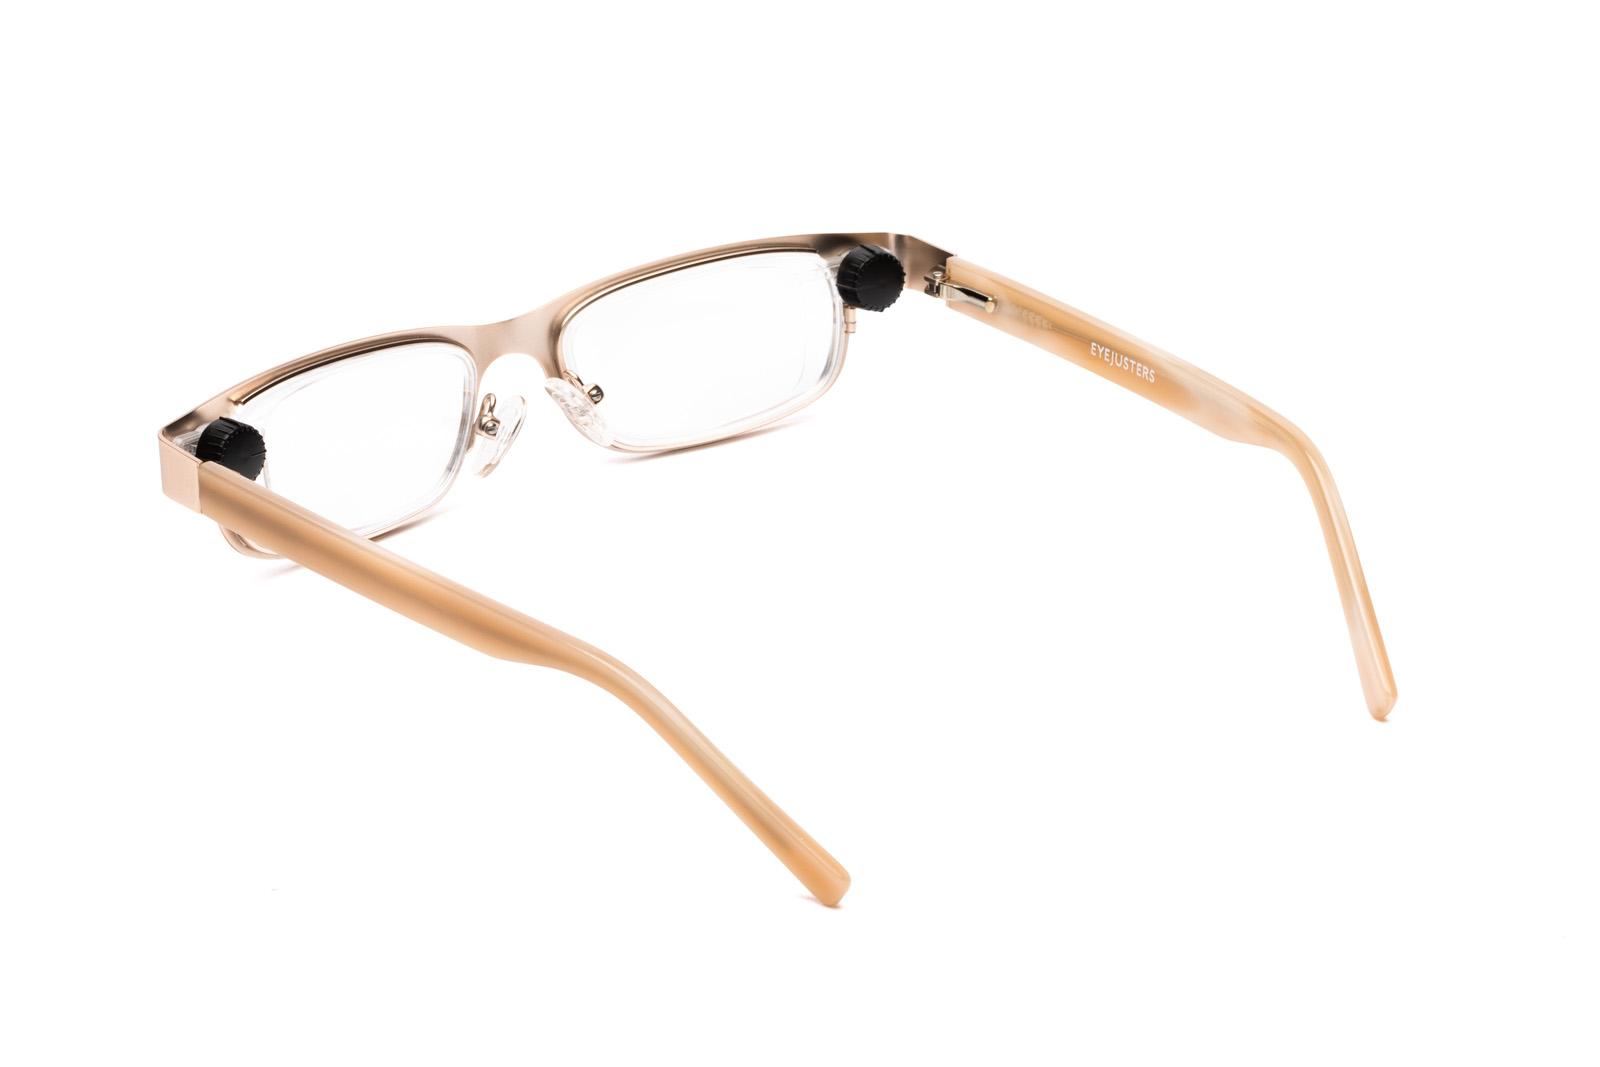 Combination Adjustable Glasses